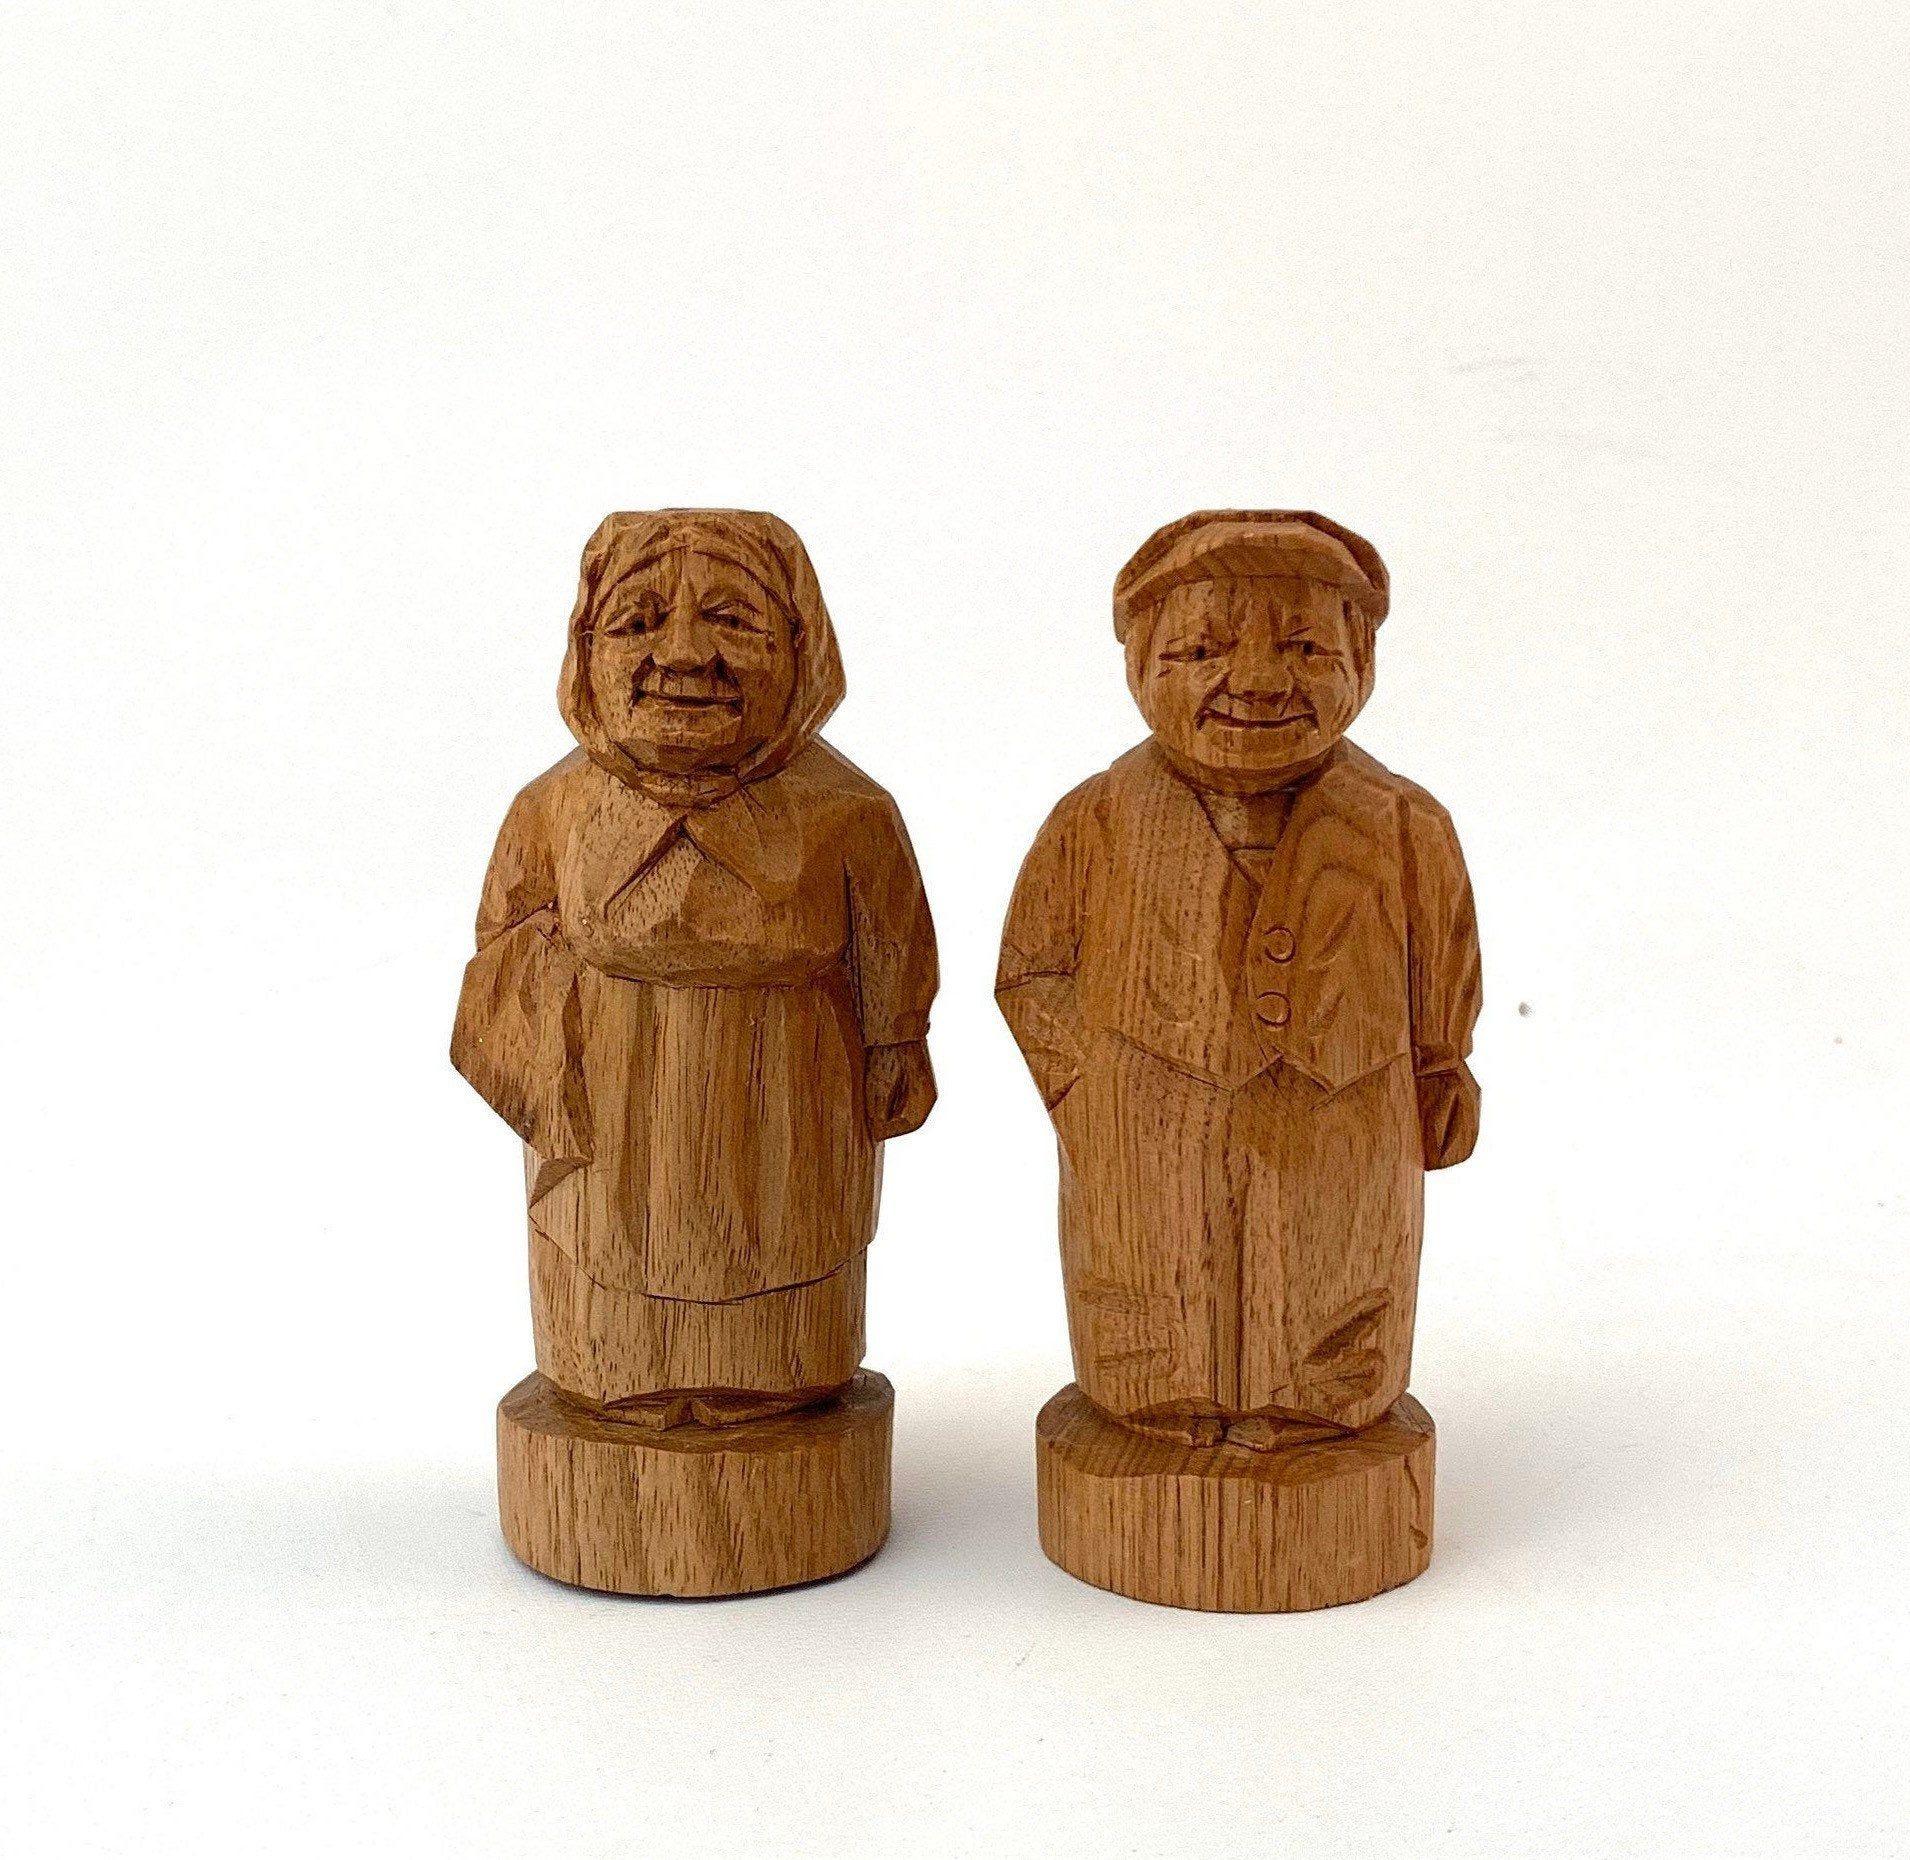 Wood Man Sculpture Carve Wood Man Carve Man Sculpture,Peasant Sculpture,Wood Peasant Man,Wood Folk art,Folk Man,Wood Man,Carve Wood Figure